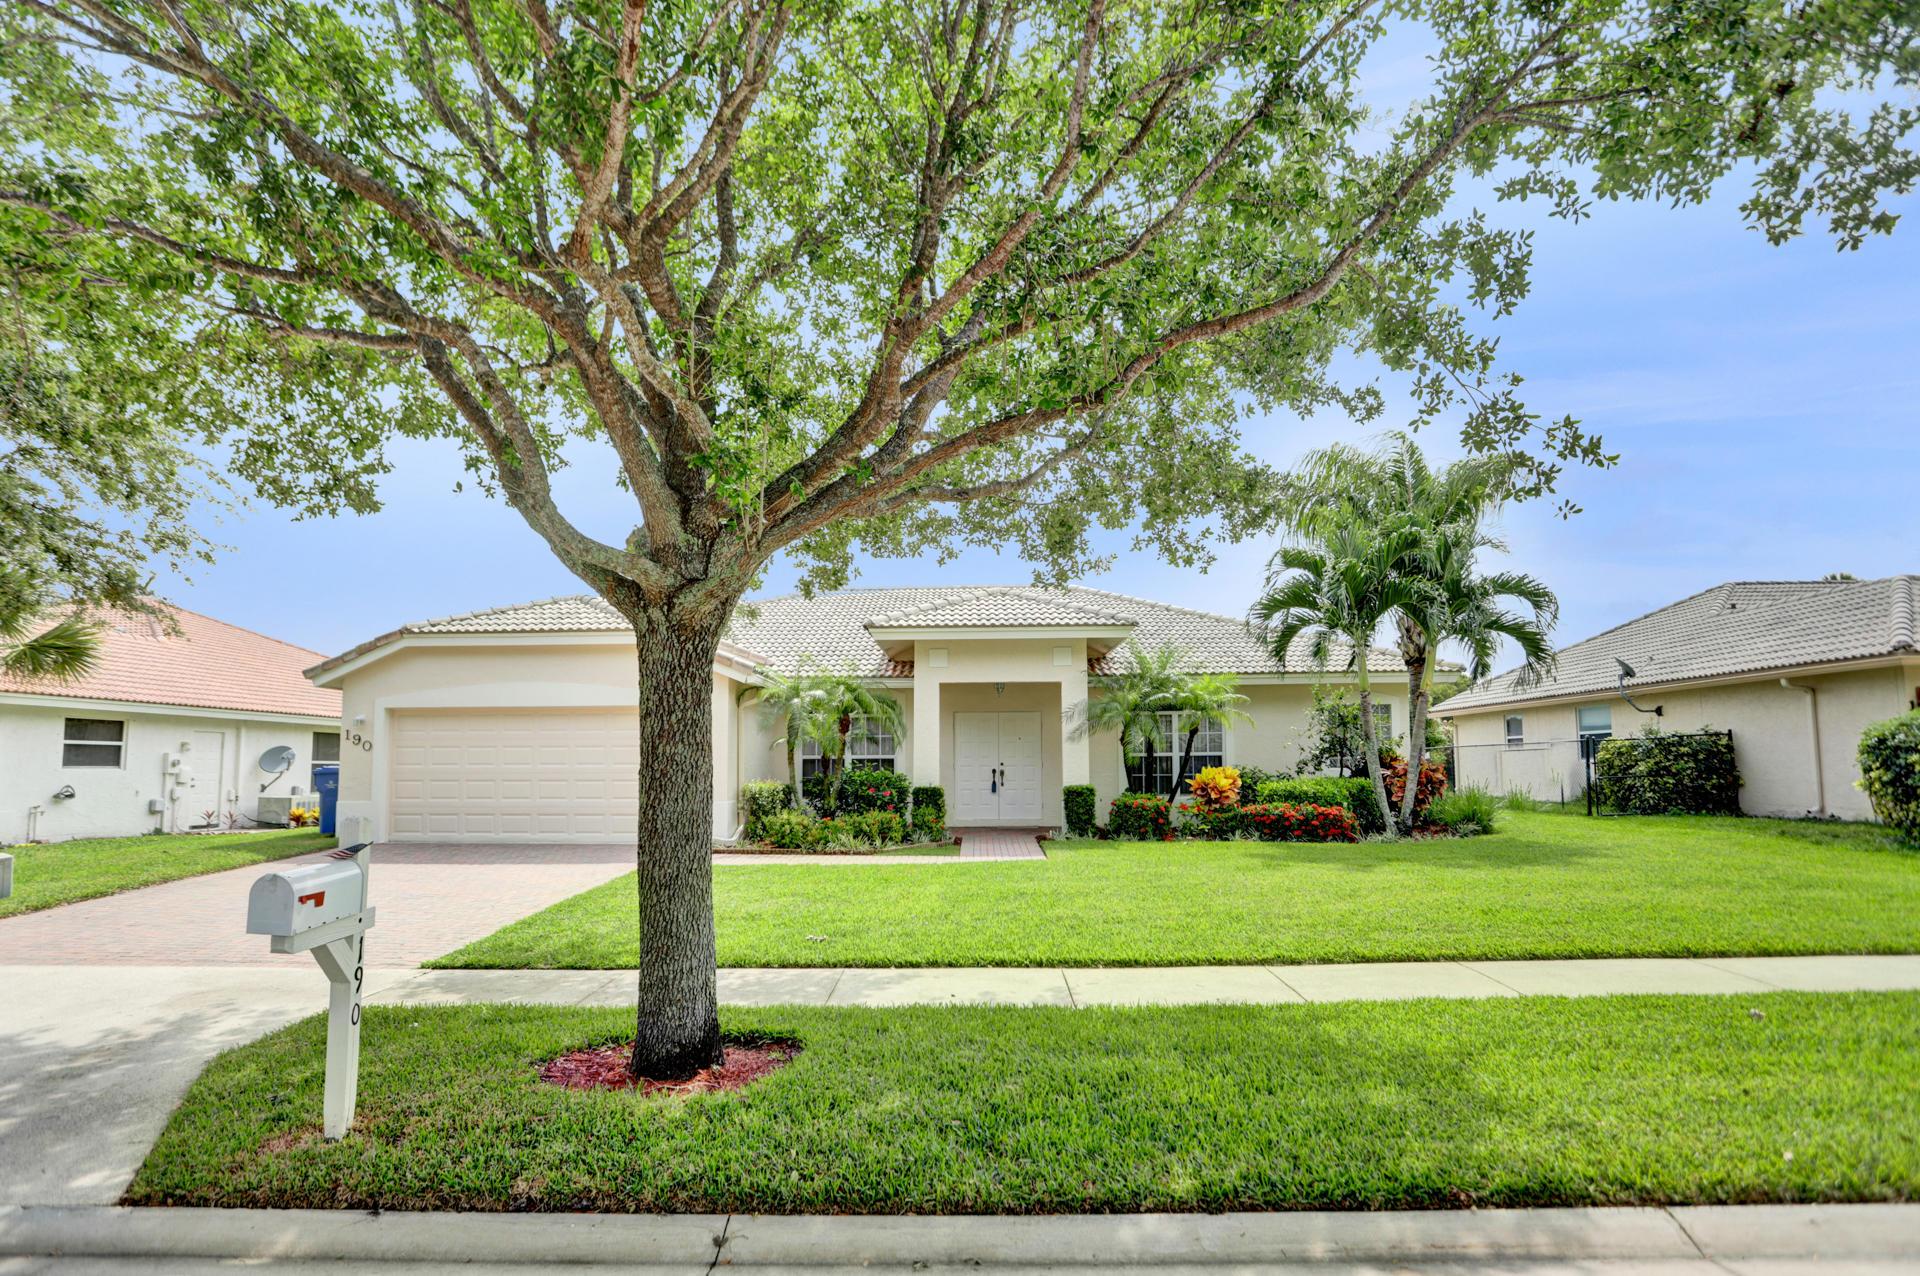 190 Cypress Trace, Royal Palm Beach, Florida